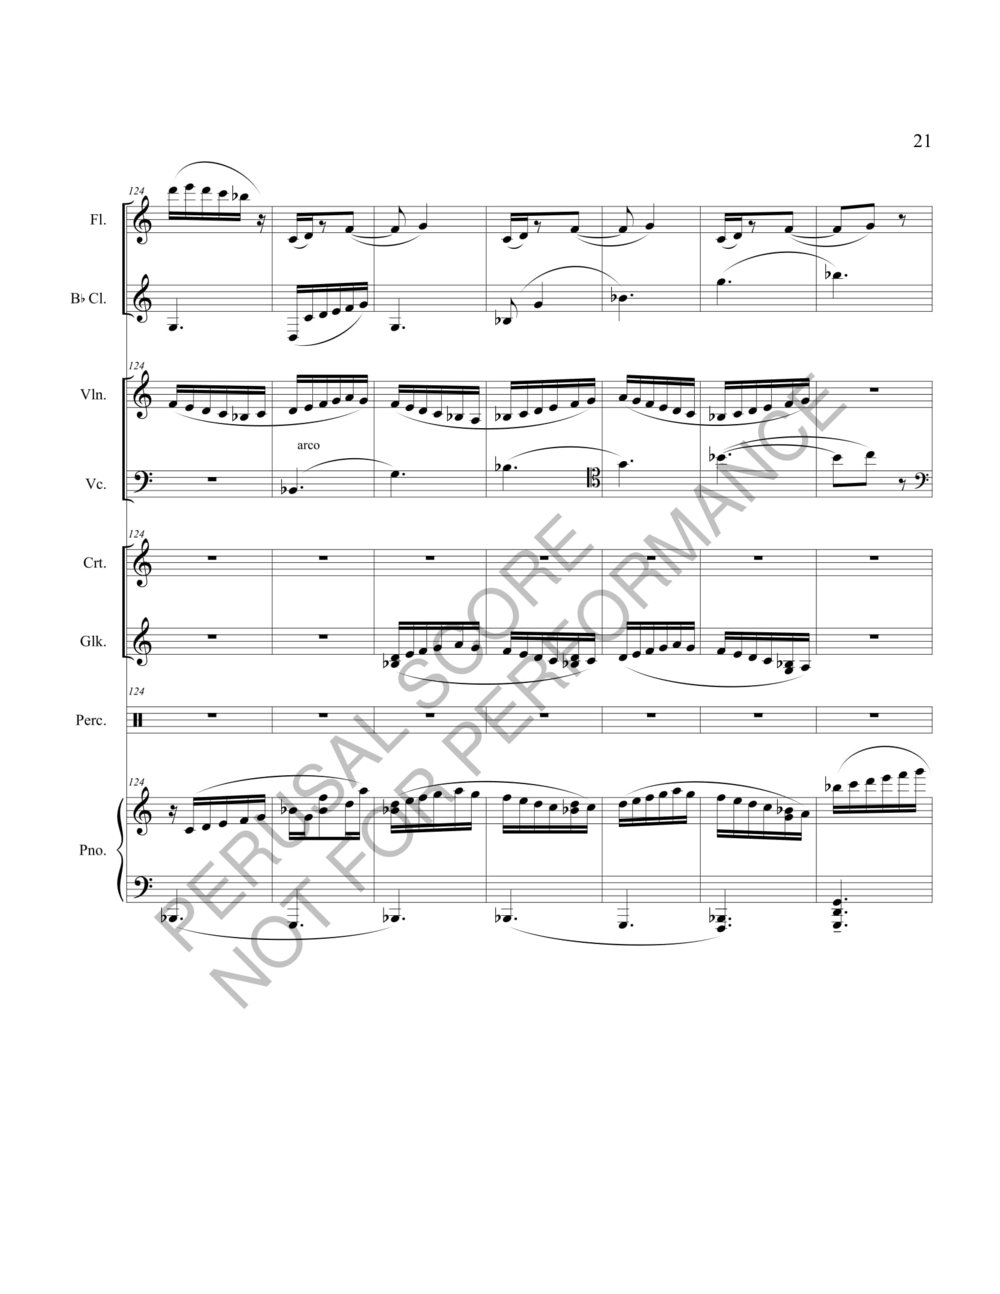 Boyd Terra Liberi Score-watermark-27.jpg